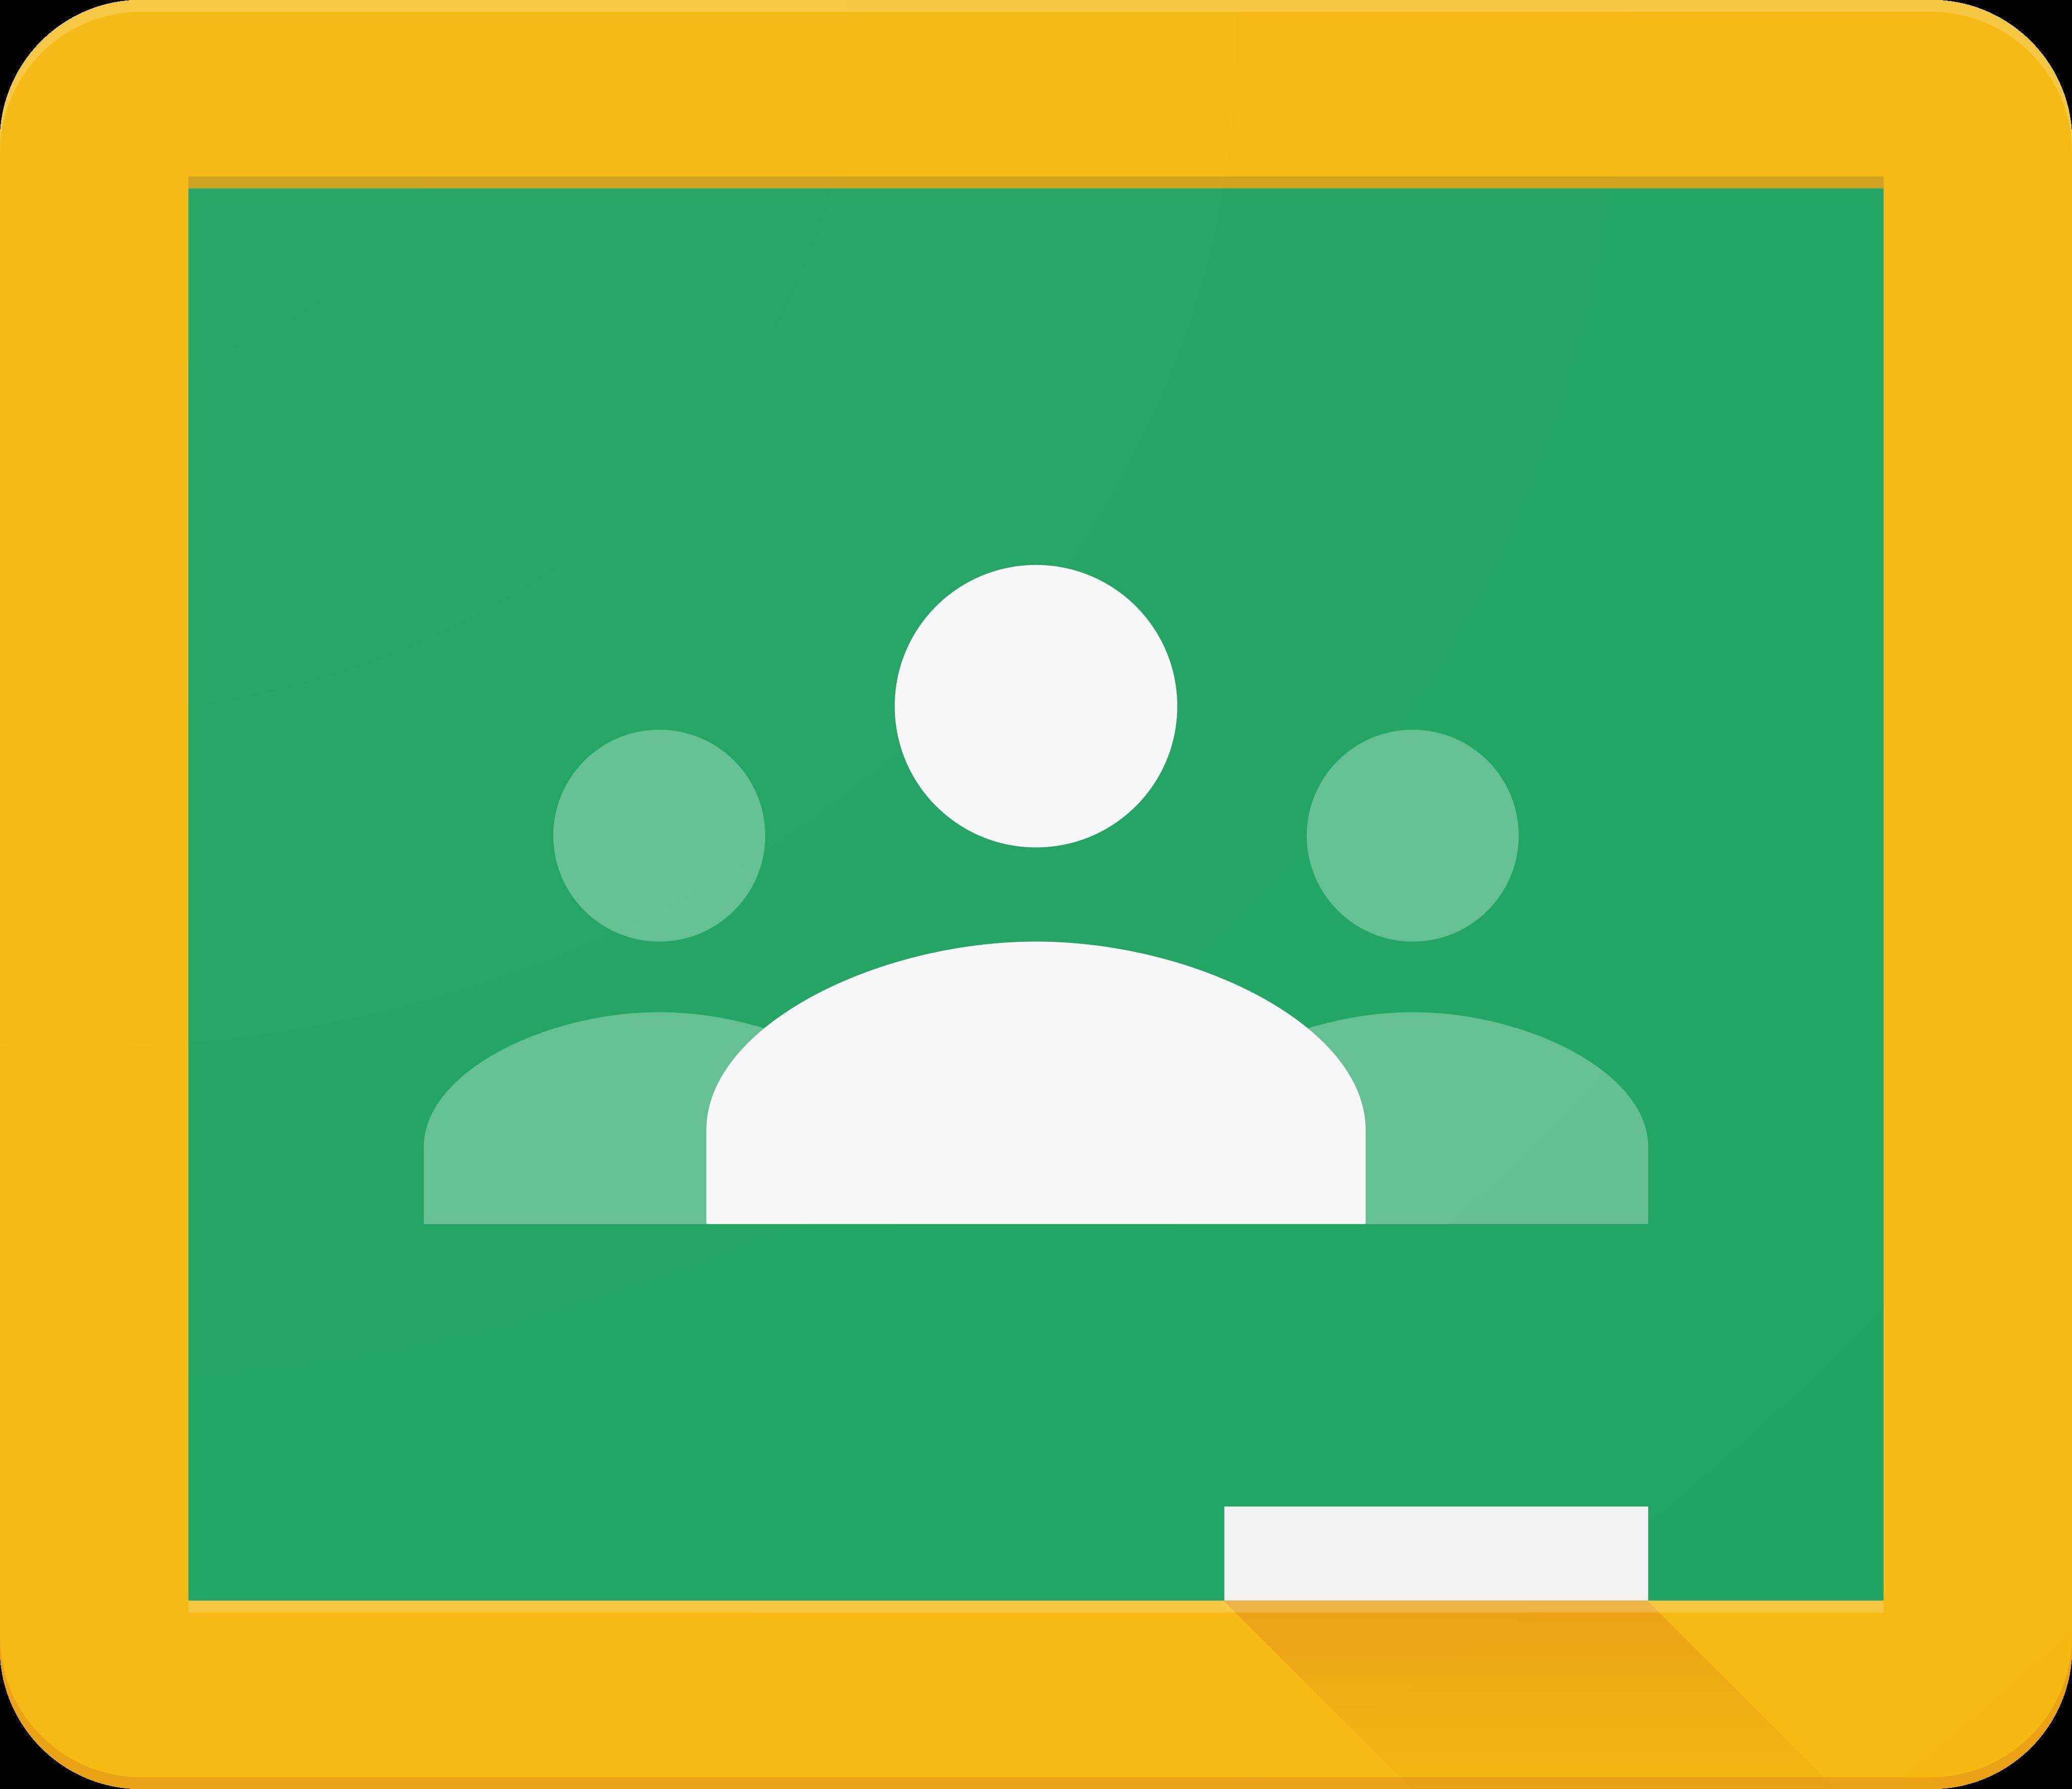 google classroom logo - Google Classroom Logo